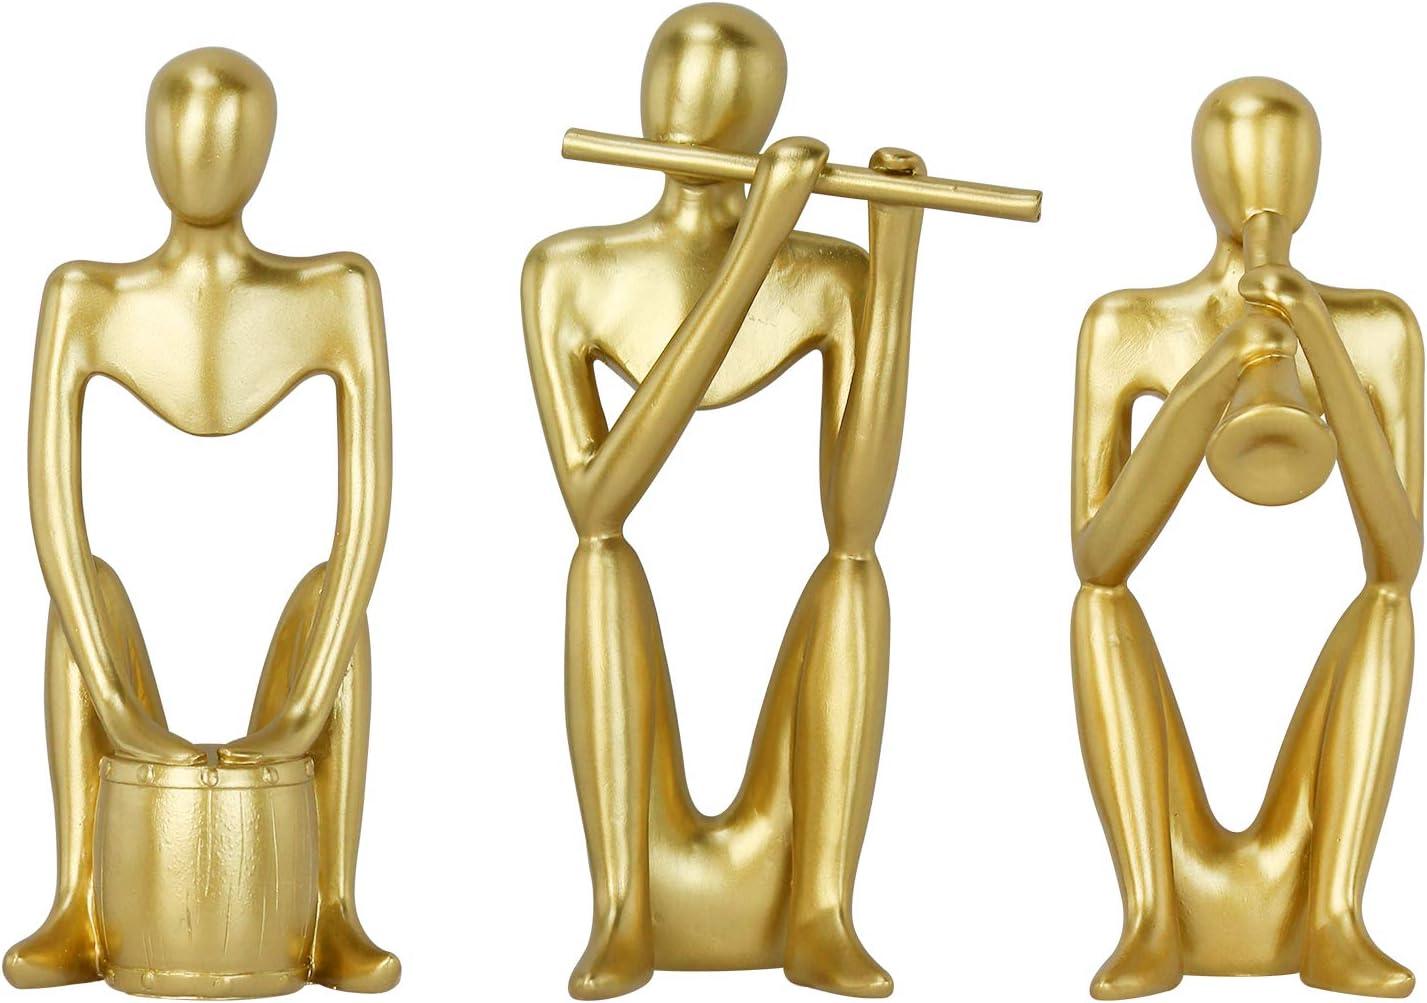 Creproly Resin Sculpture Art Small Sculpture Gold Abstract Statue Figurine Kit Home Office Desktop Bookshelf Decor 3Pcs (Band)